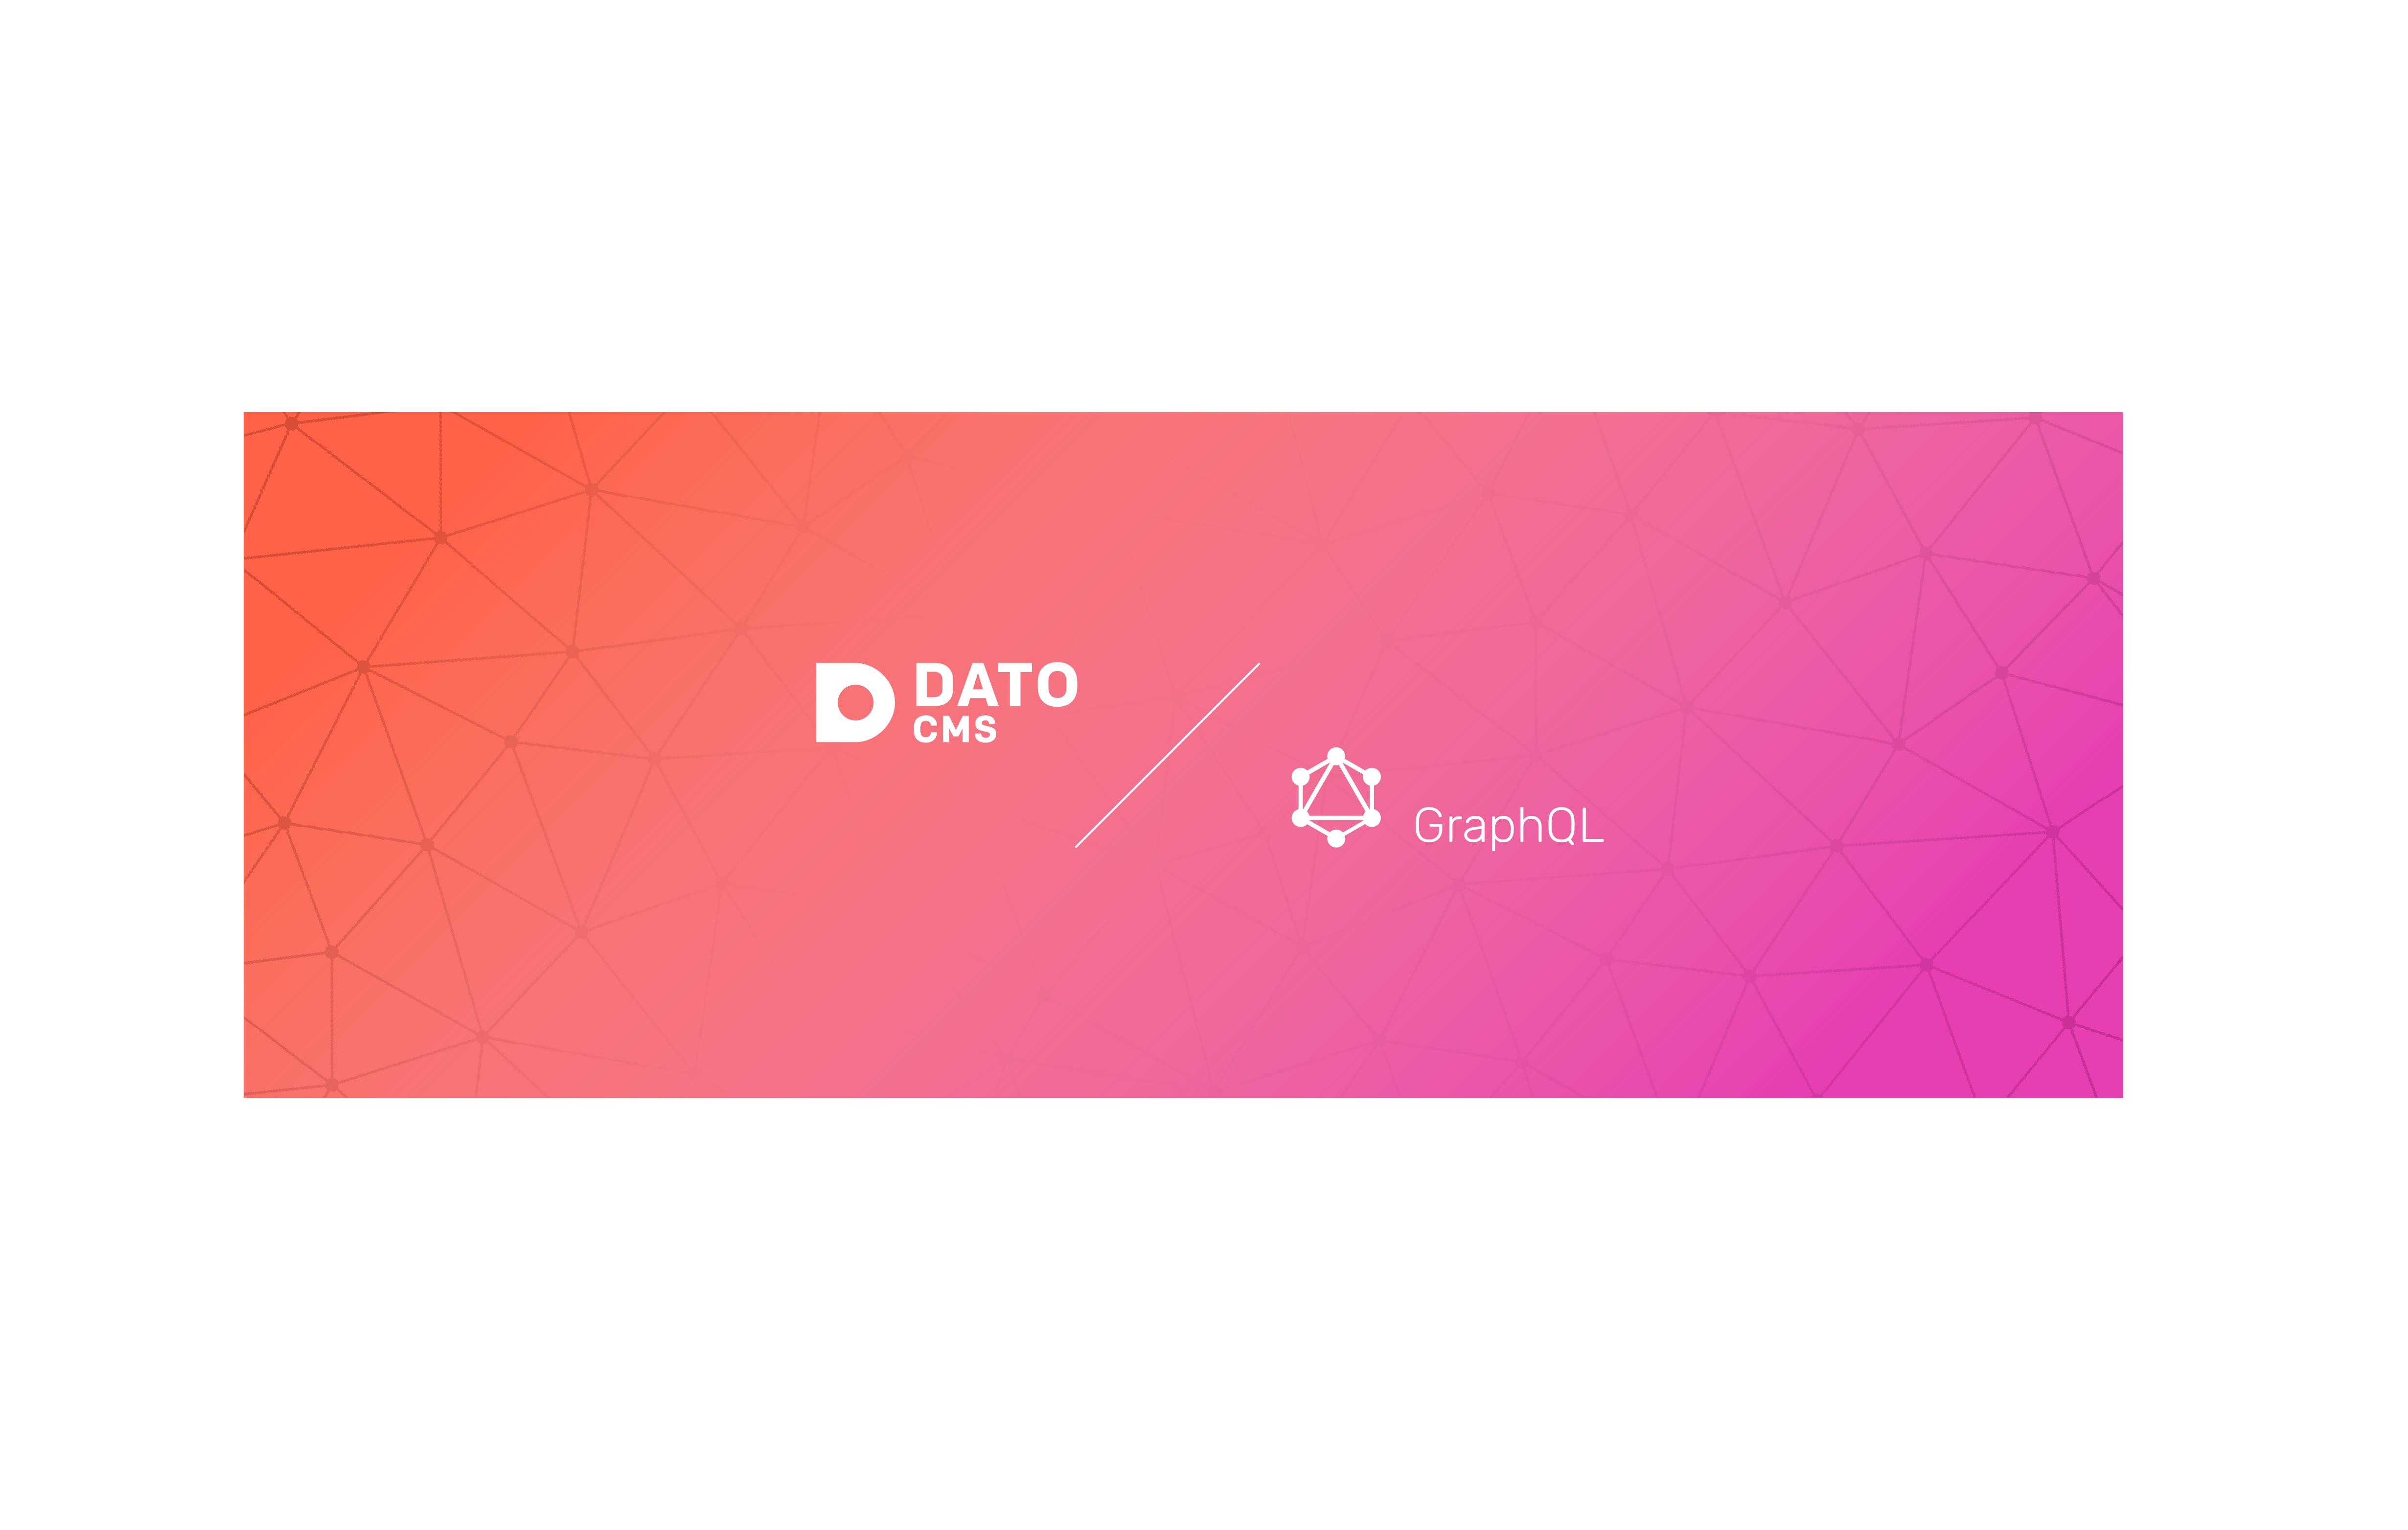 GraphQL and DatoCMS - DatoCMS